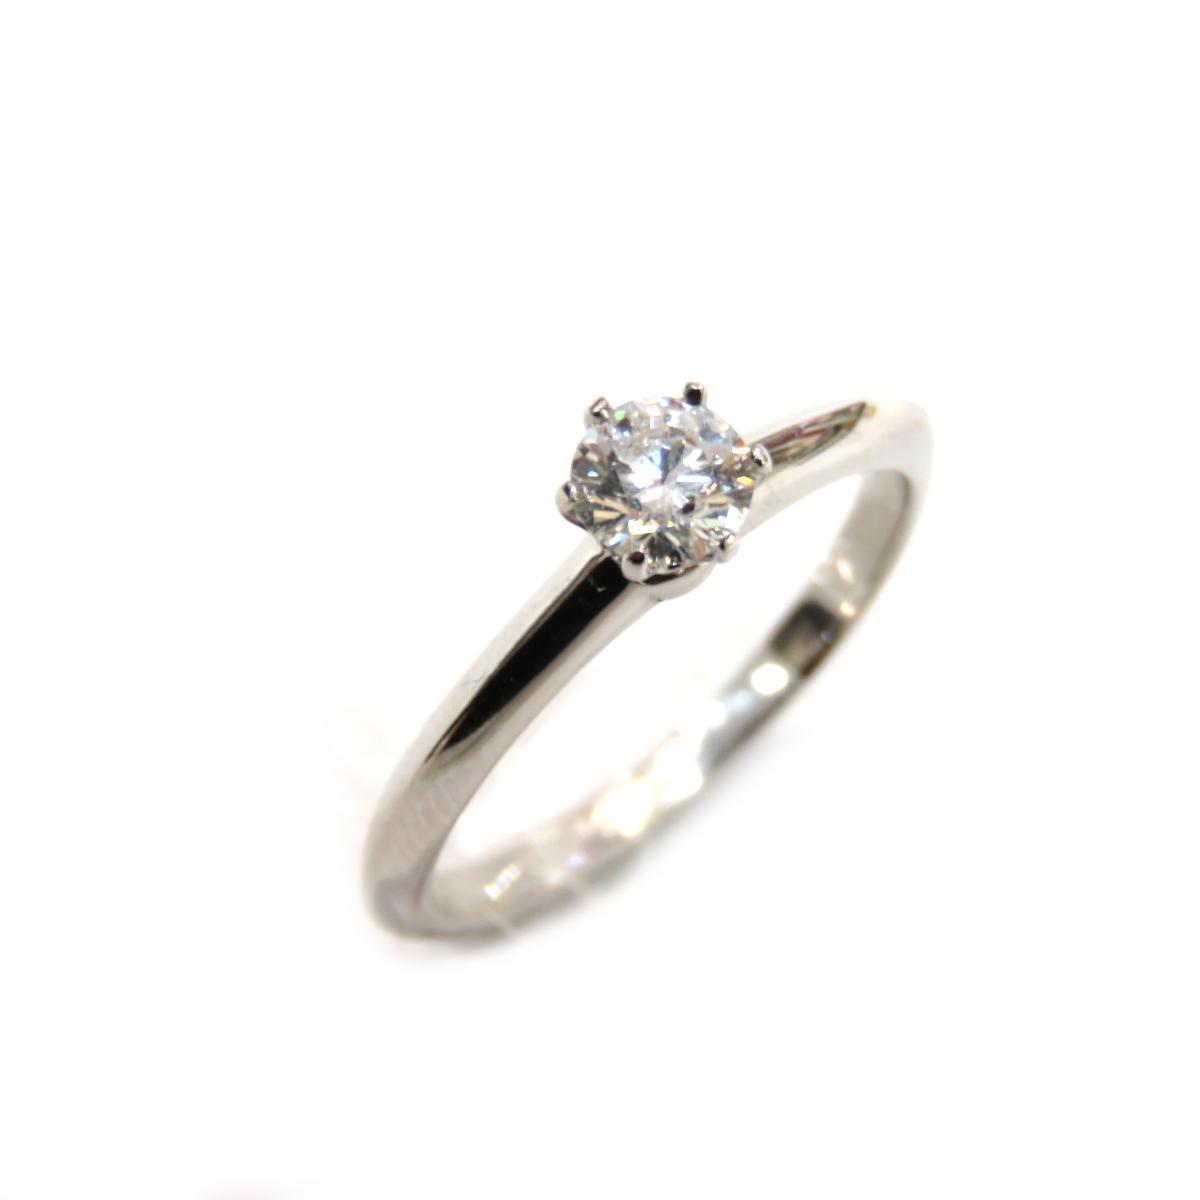 TIFFANY & CO Solitaire Ring Ladies PT950 Diamond (D0.24ct) No. 9